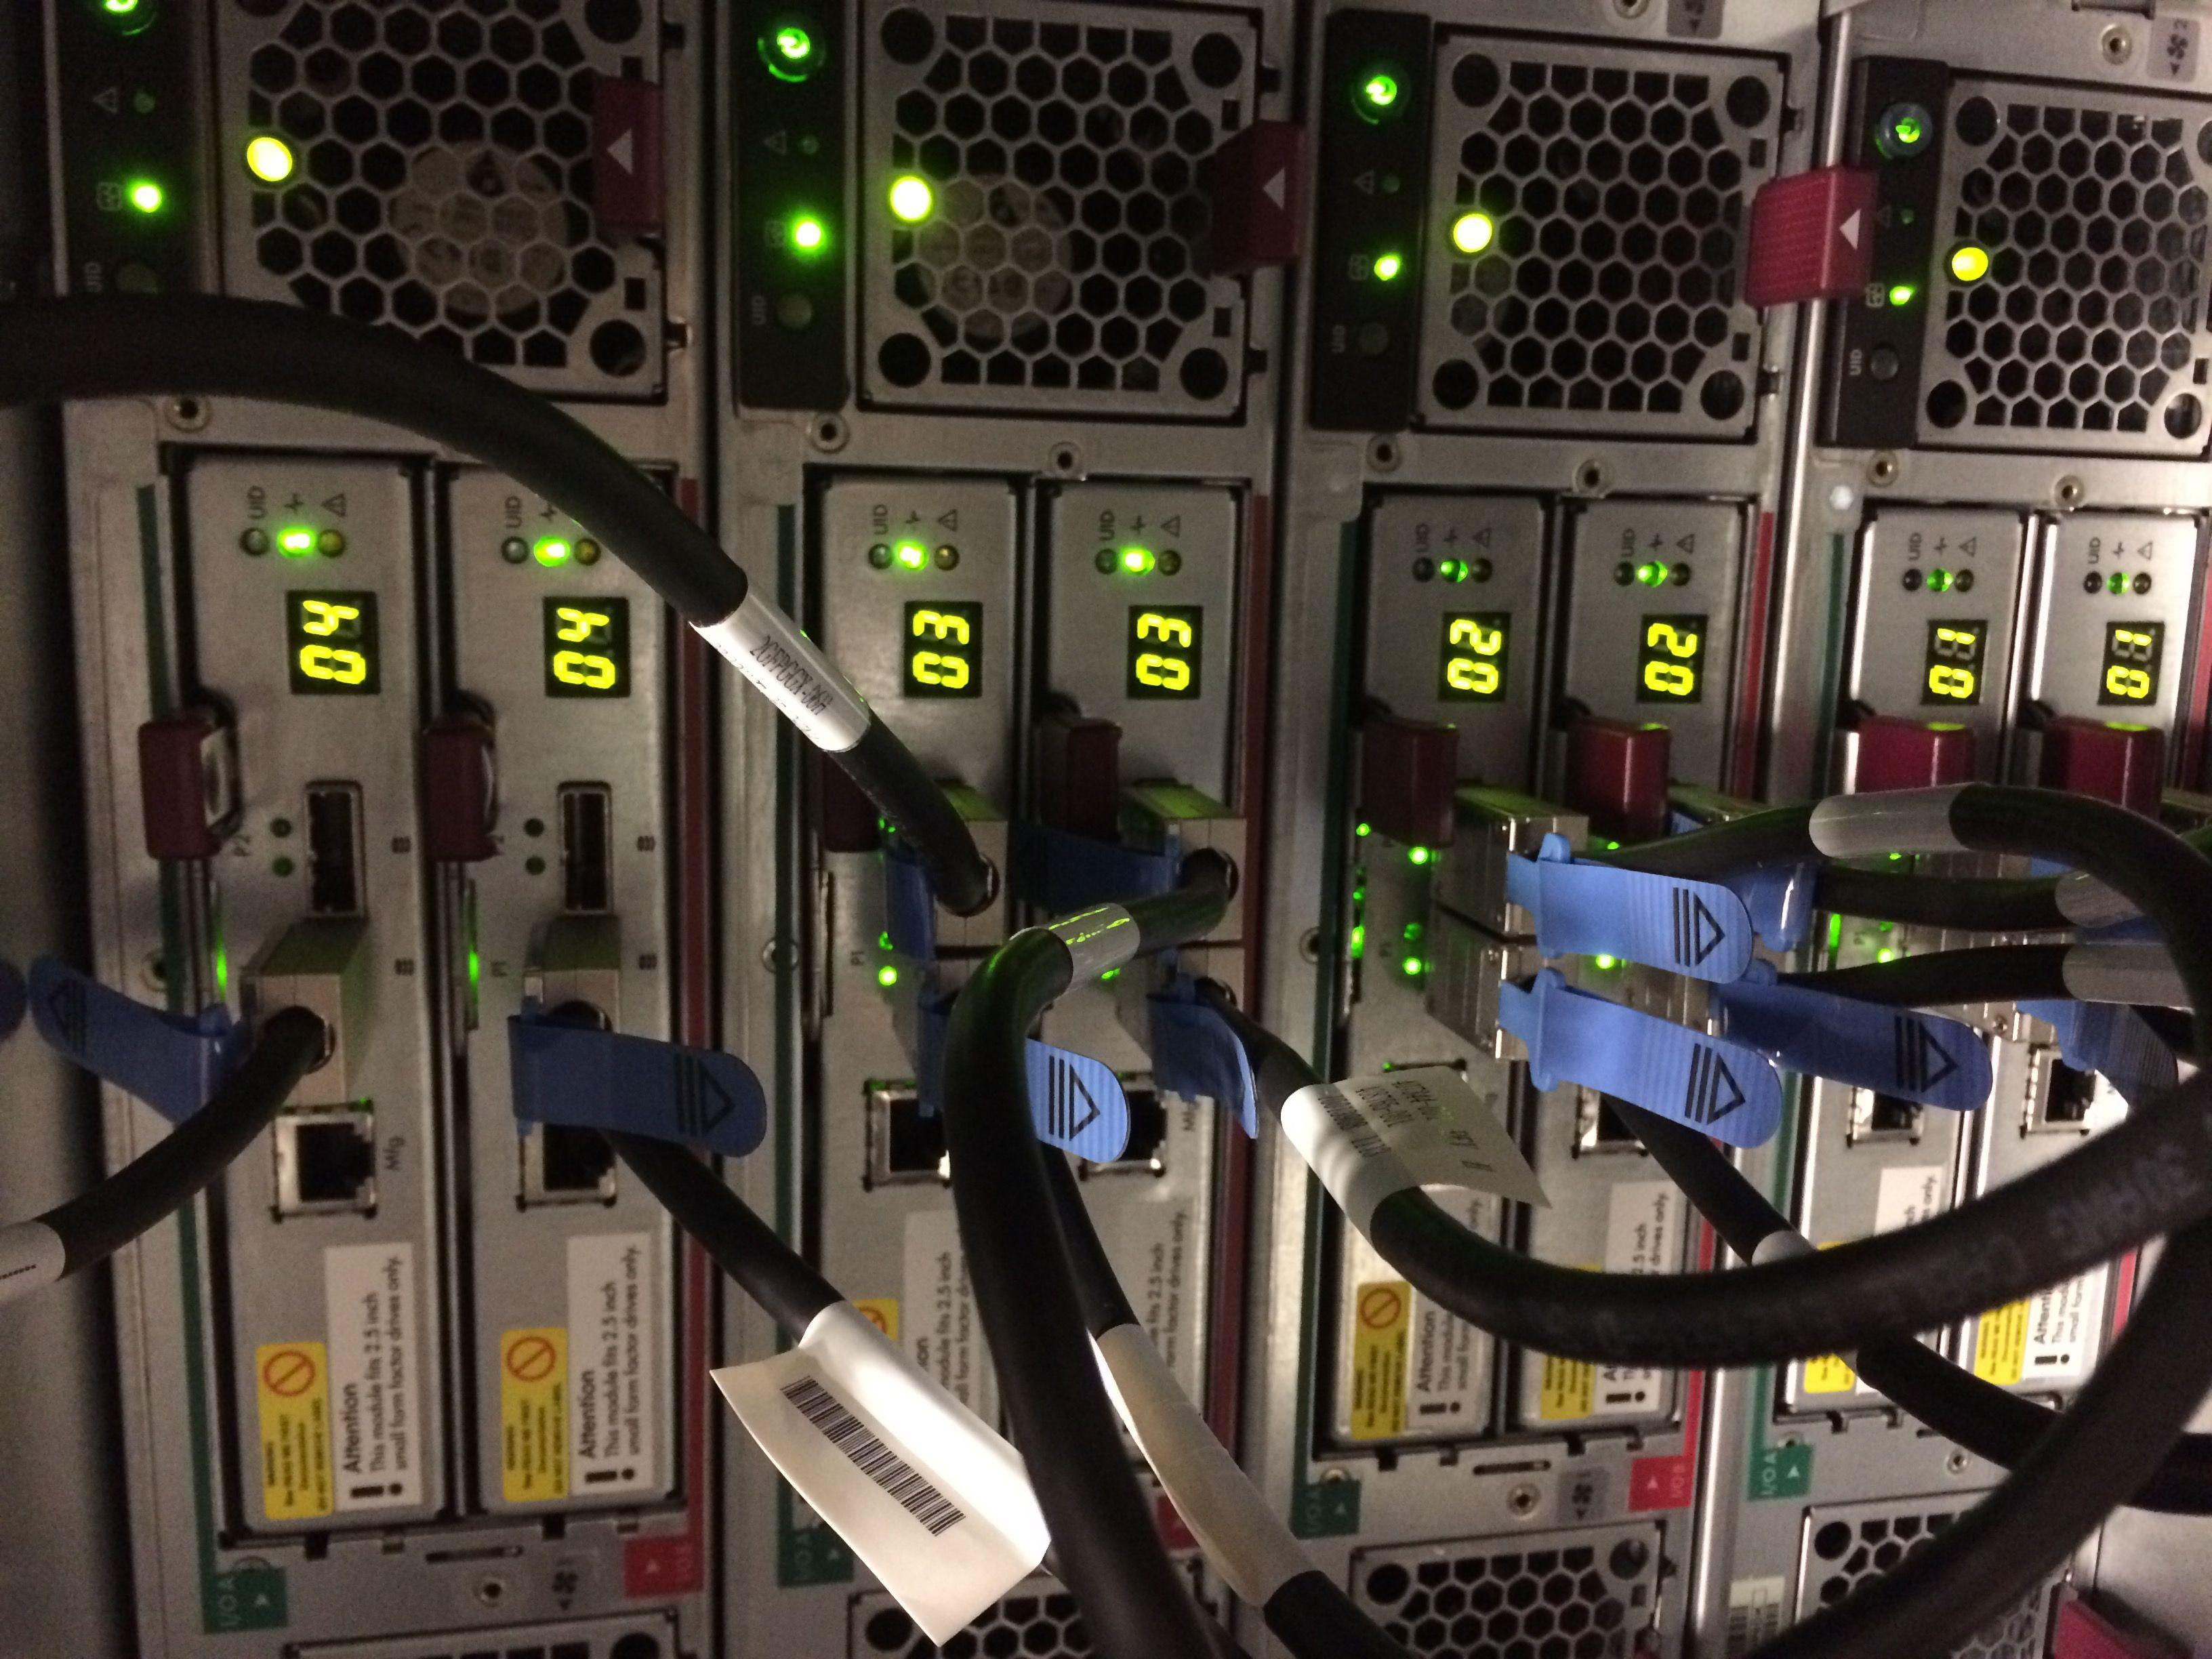 4x Storage Works D2700 Disk Enclosure (AJ941A)